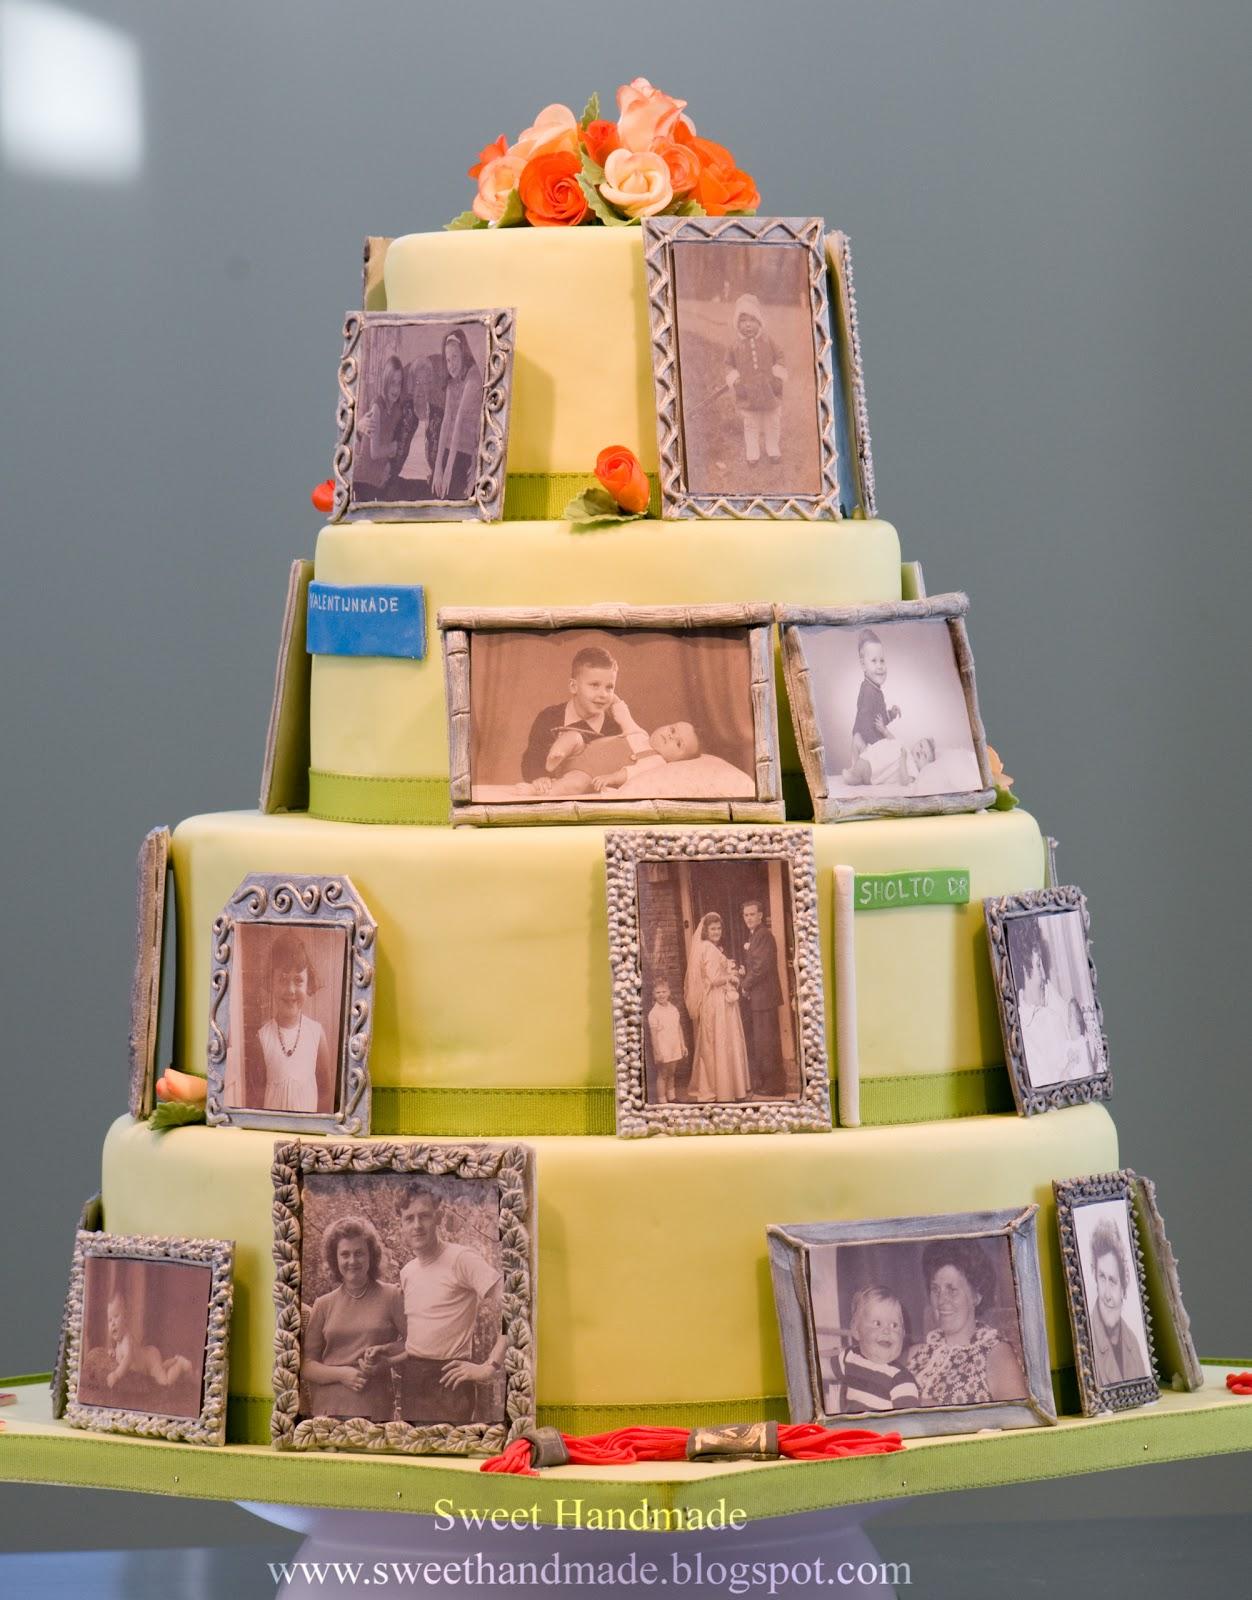 Sweet Handmade Cookies Photo Frame Birthday Cake